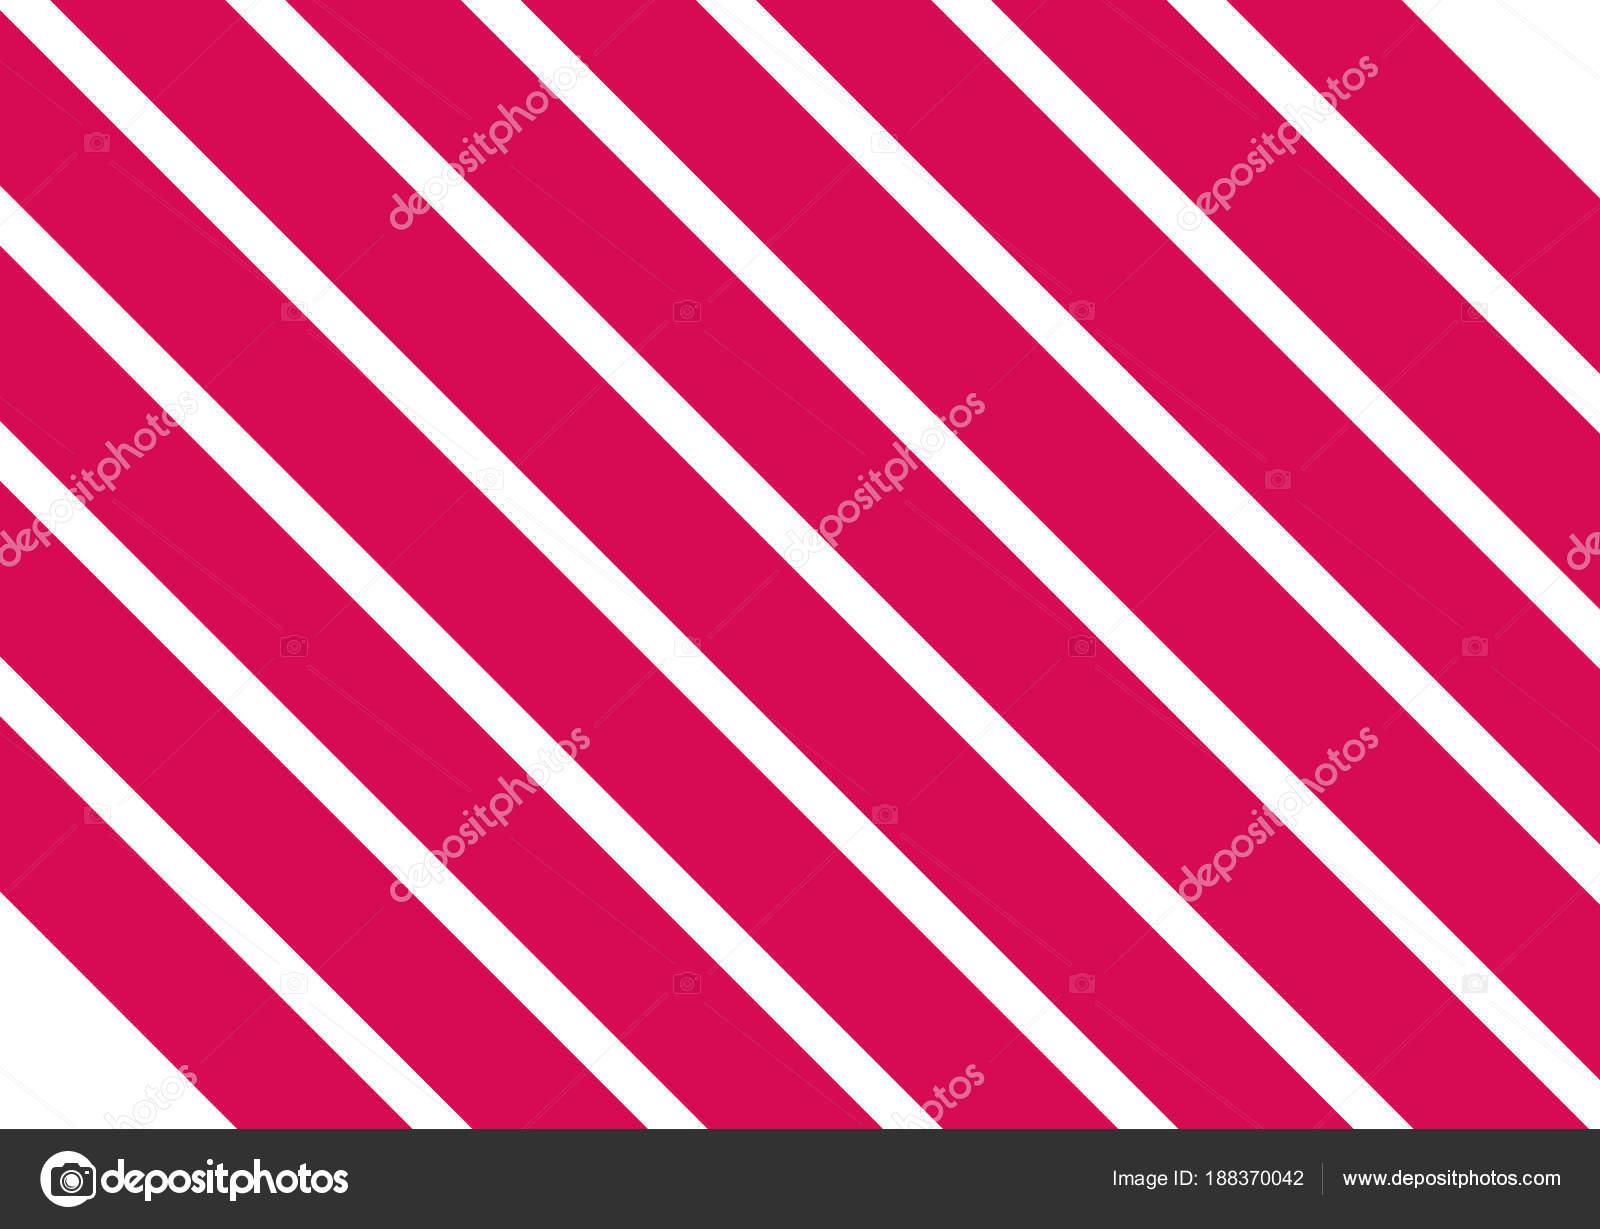 Sfondo Strisce Rosa E Bianco Strisce Rosa Su Sfondo Bianco Motivo